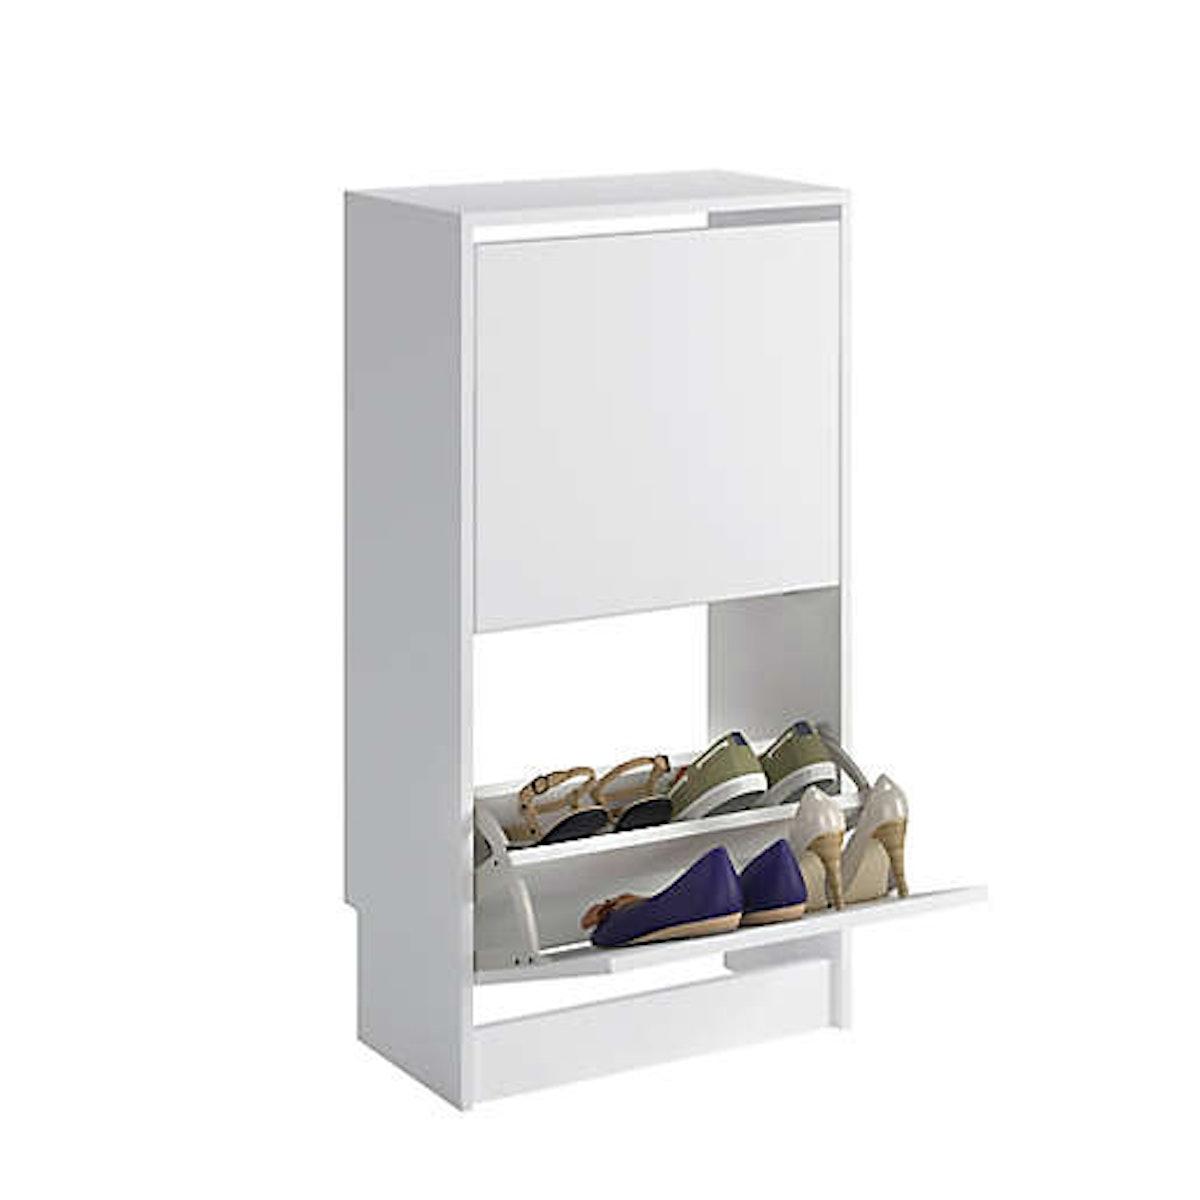 Sauder Tilting Door Shoe Storage in White